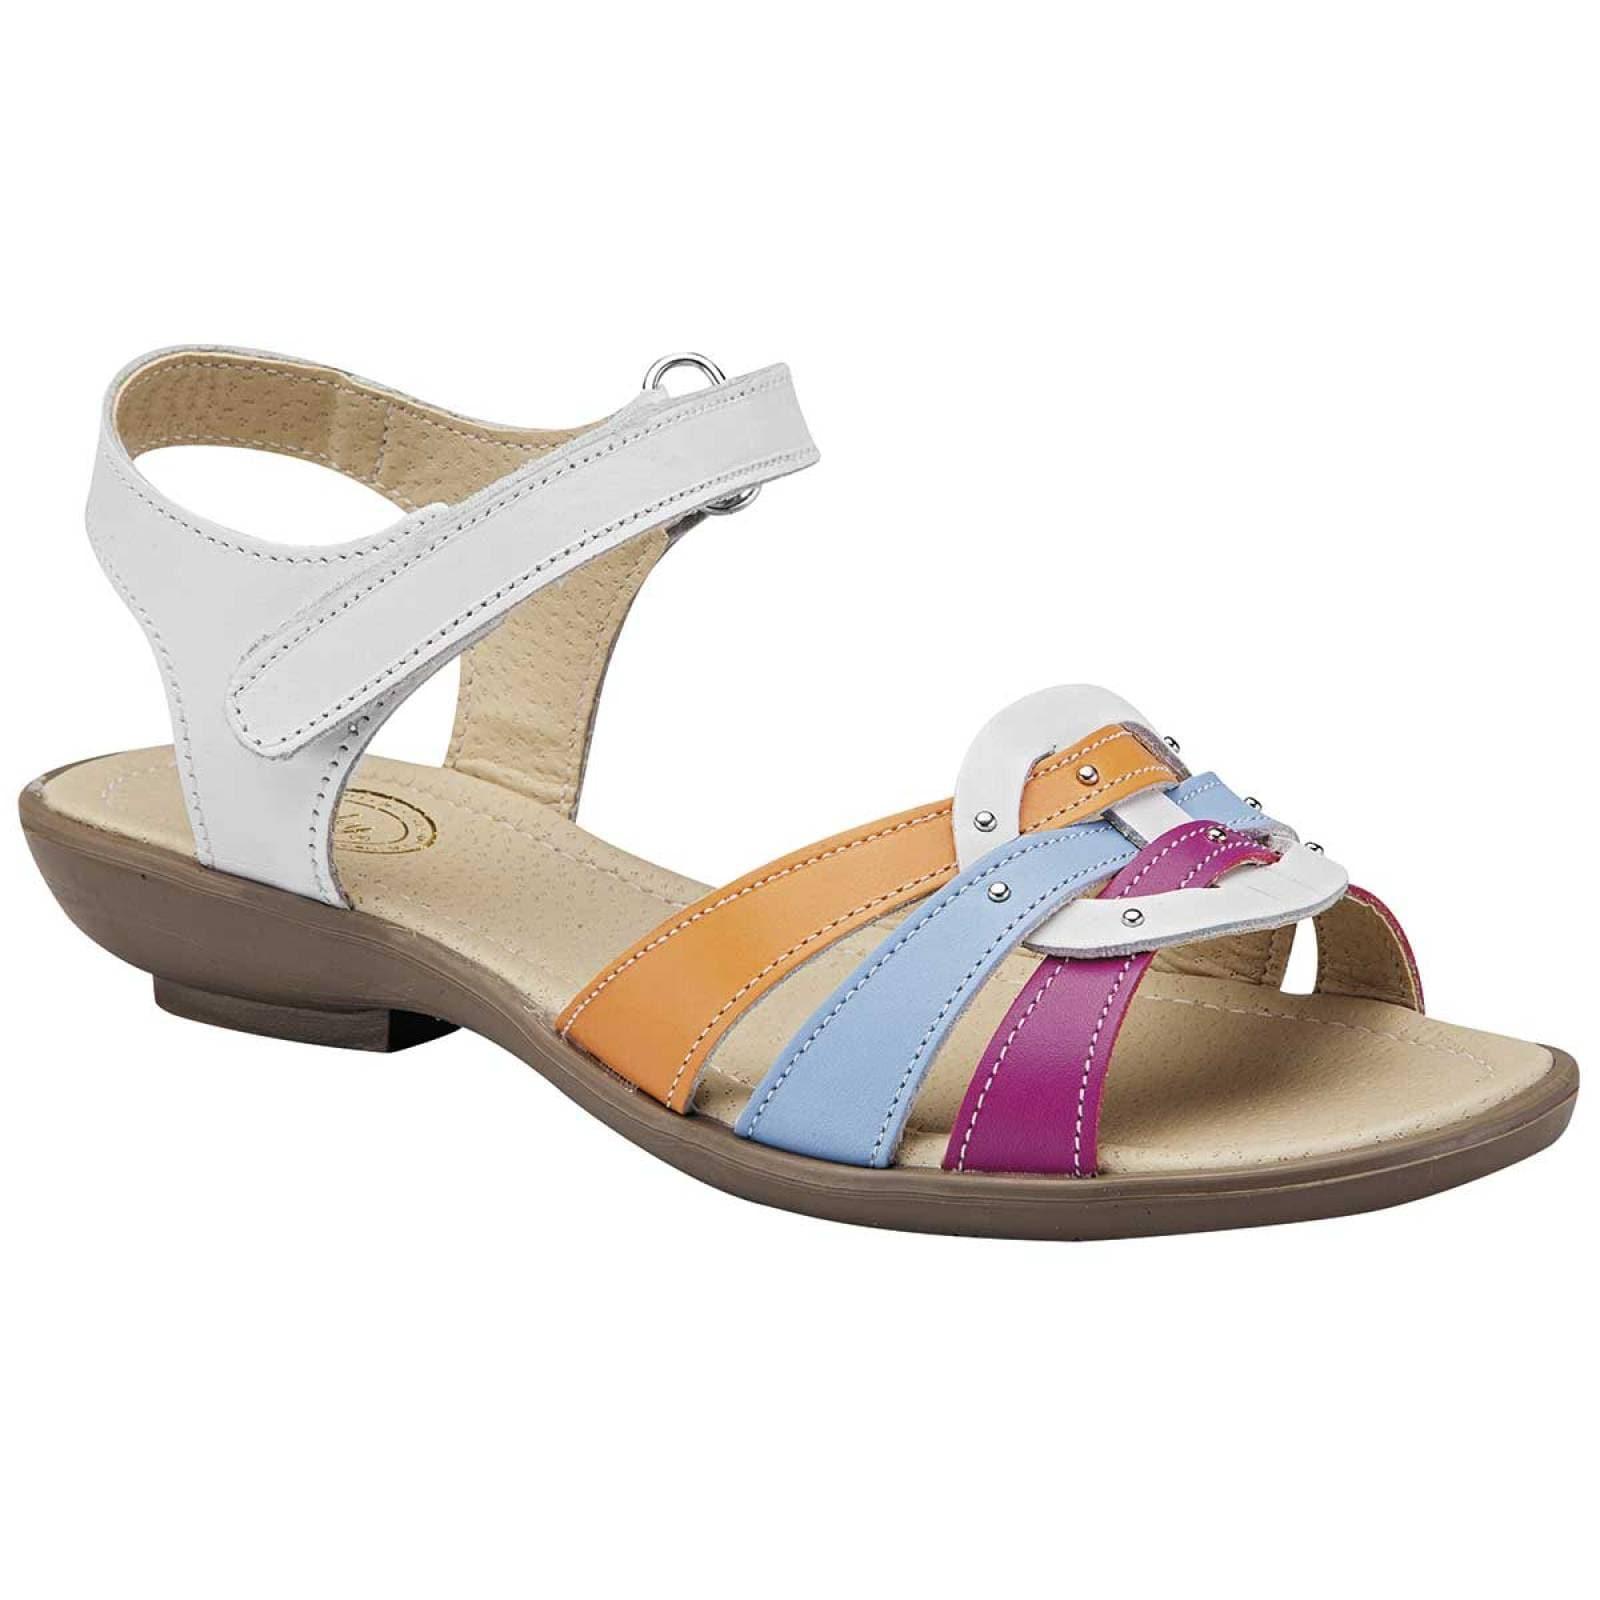 Faby Sandalia Mujer Blanco multicolor